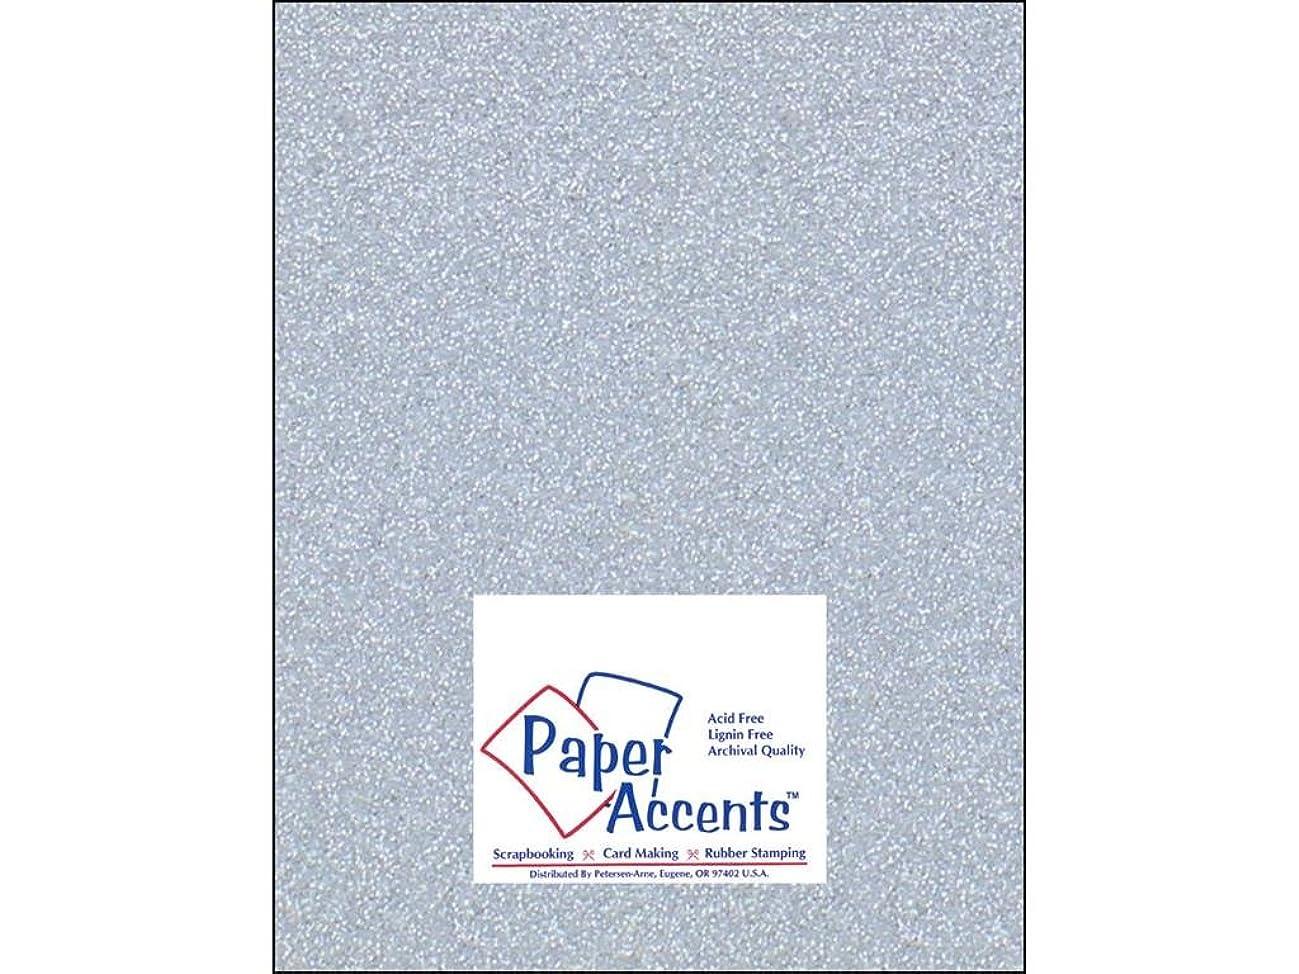 Accent Design Paper Accents Cdstk Glitter 8.5x11 85# Silver